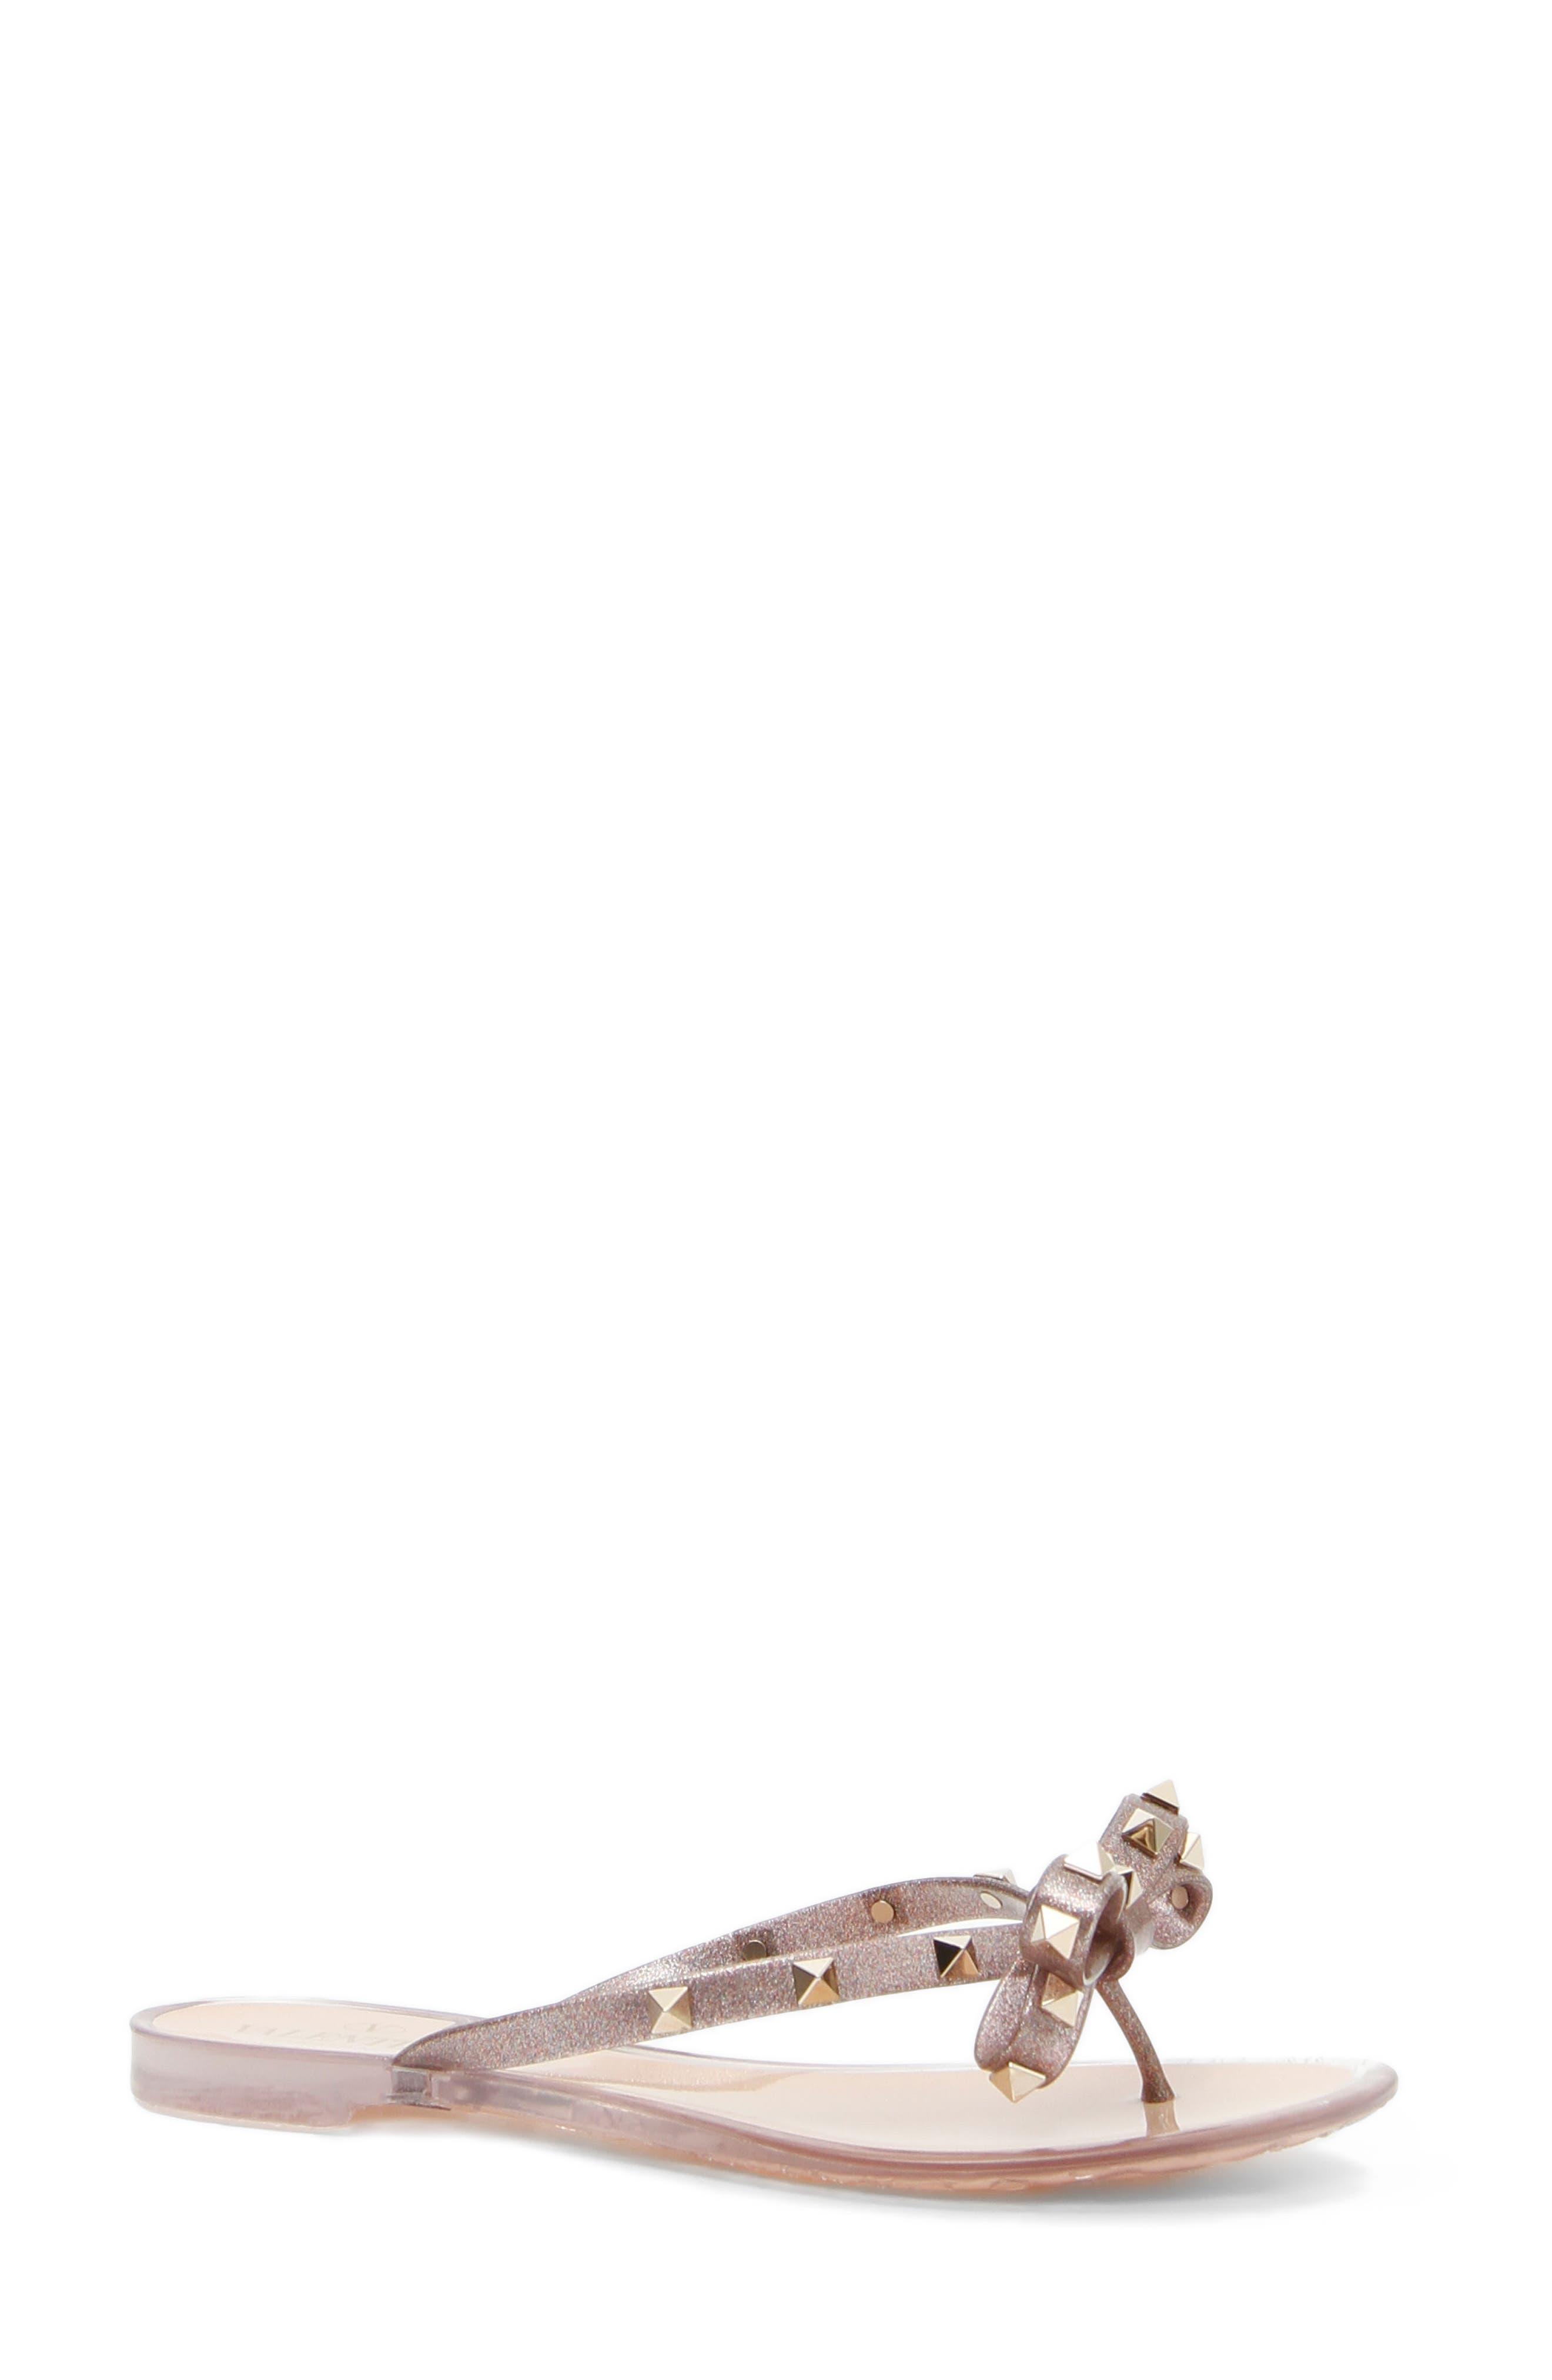 Valentino Valentino Woman Gold-tone Beaded Cuff Black Size sVWFhzeG6T